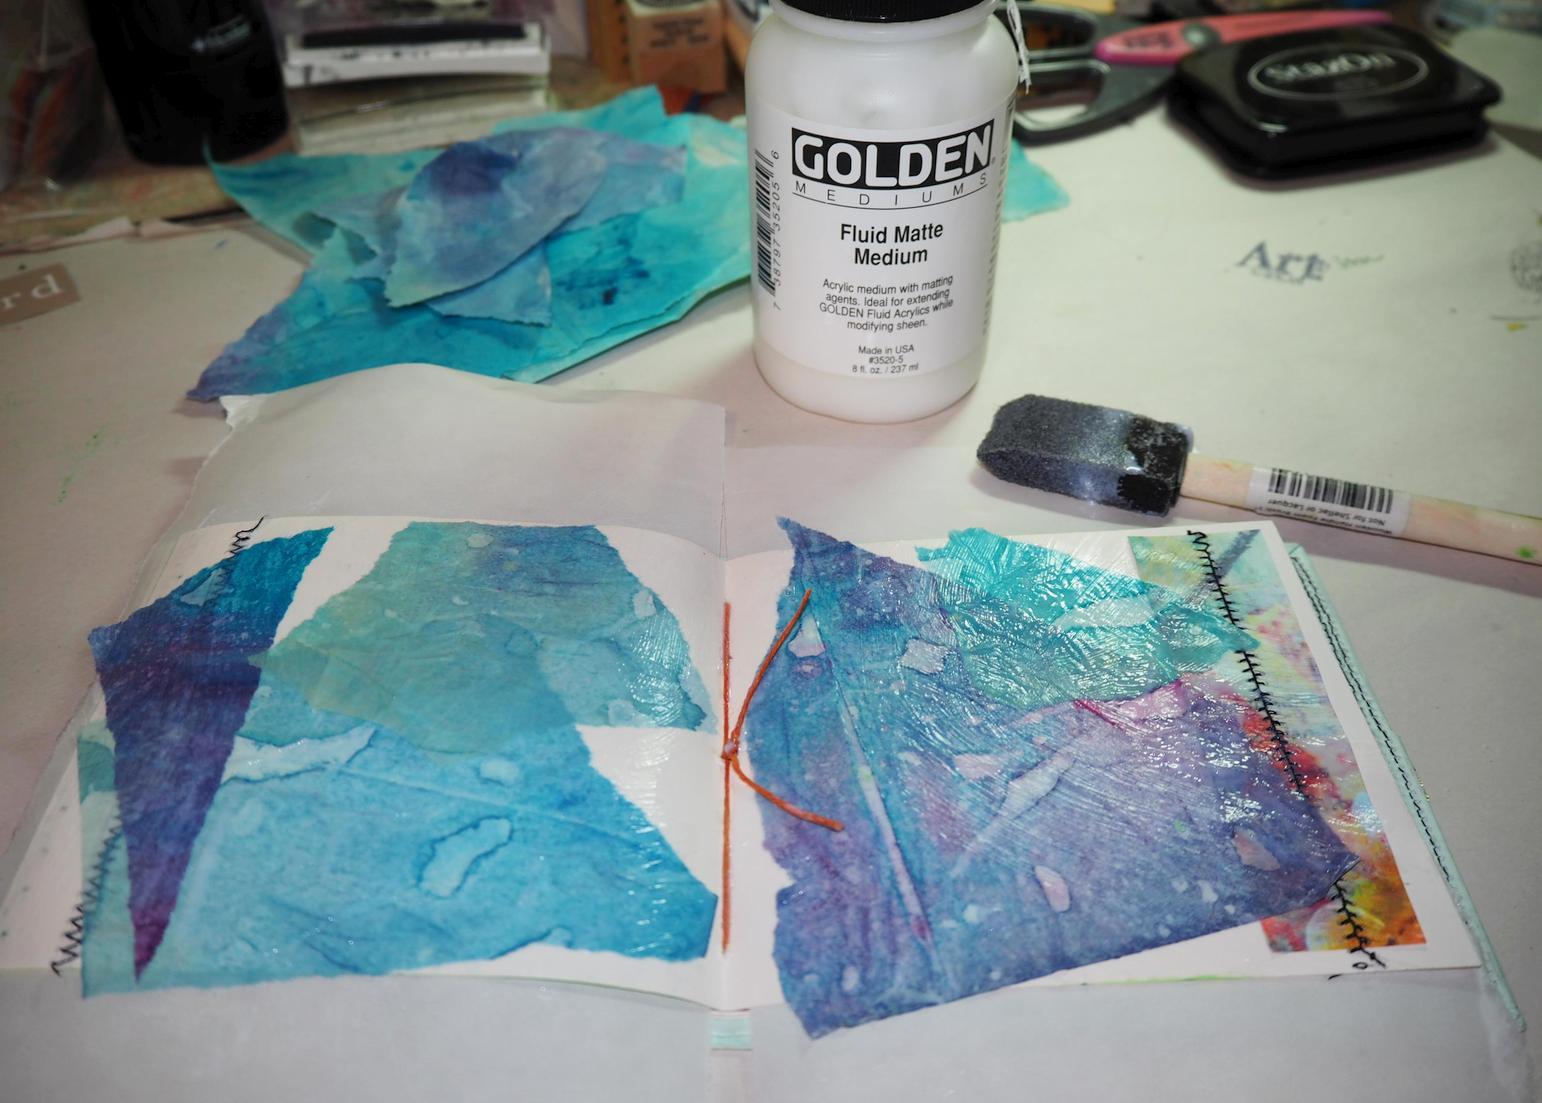 Applied to my sweet handmade Journal  (thanks, Frieda!) with Matte Medium